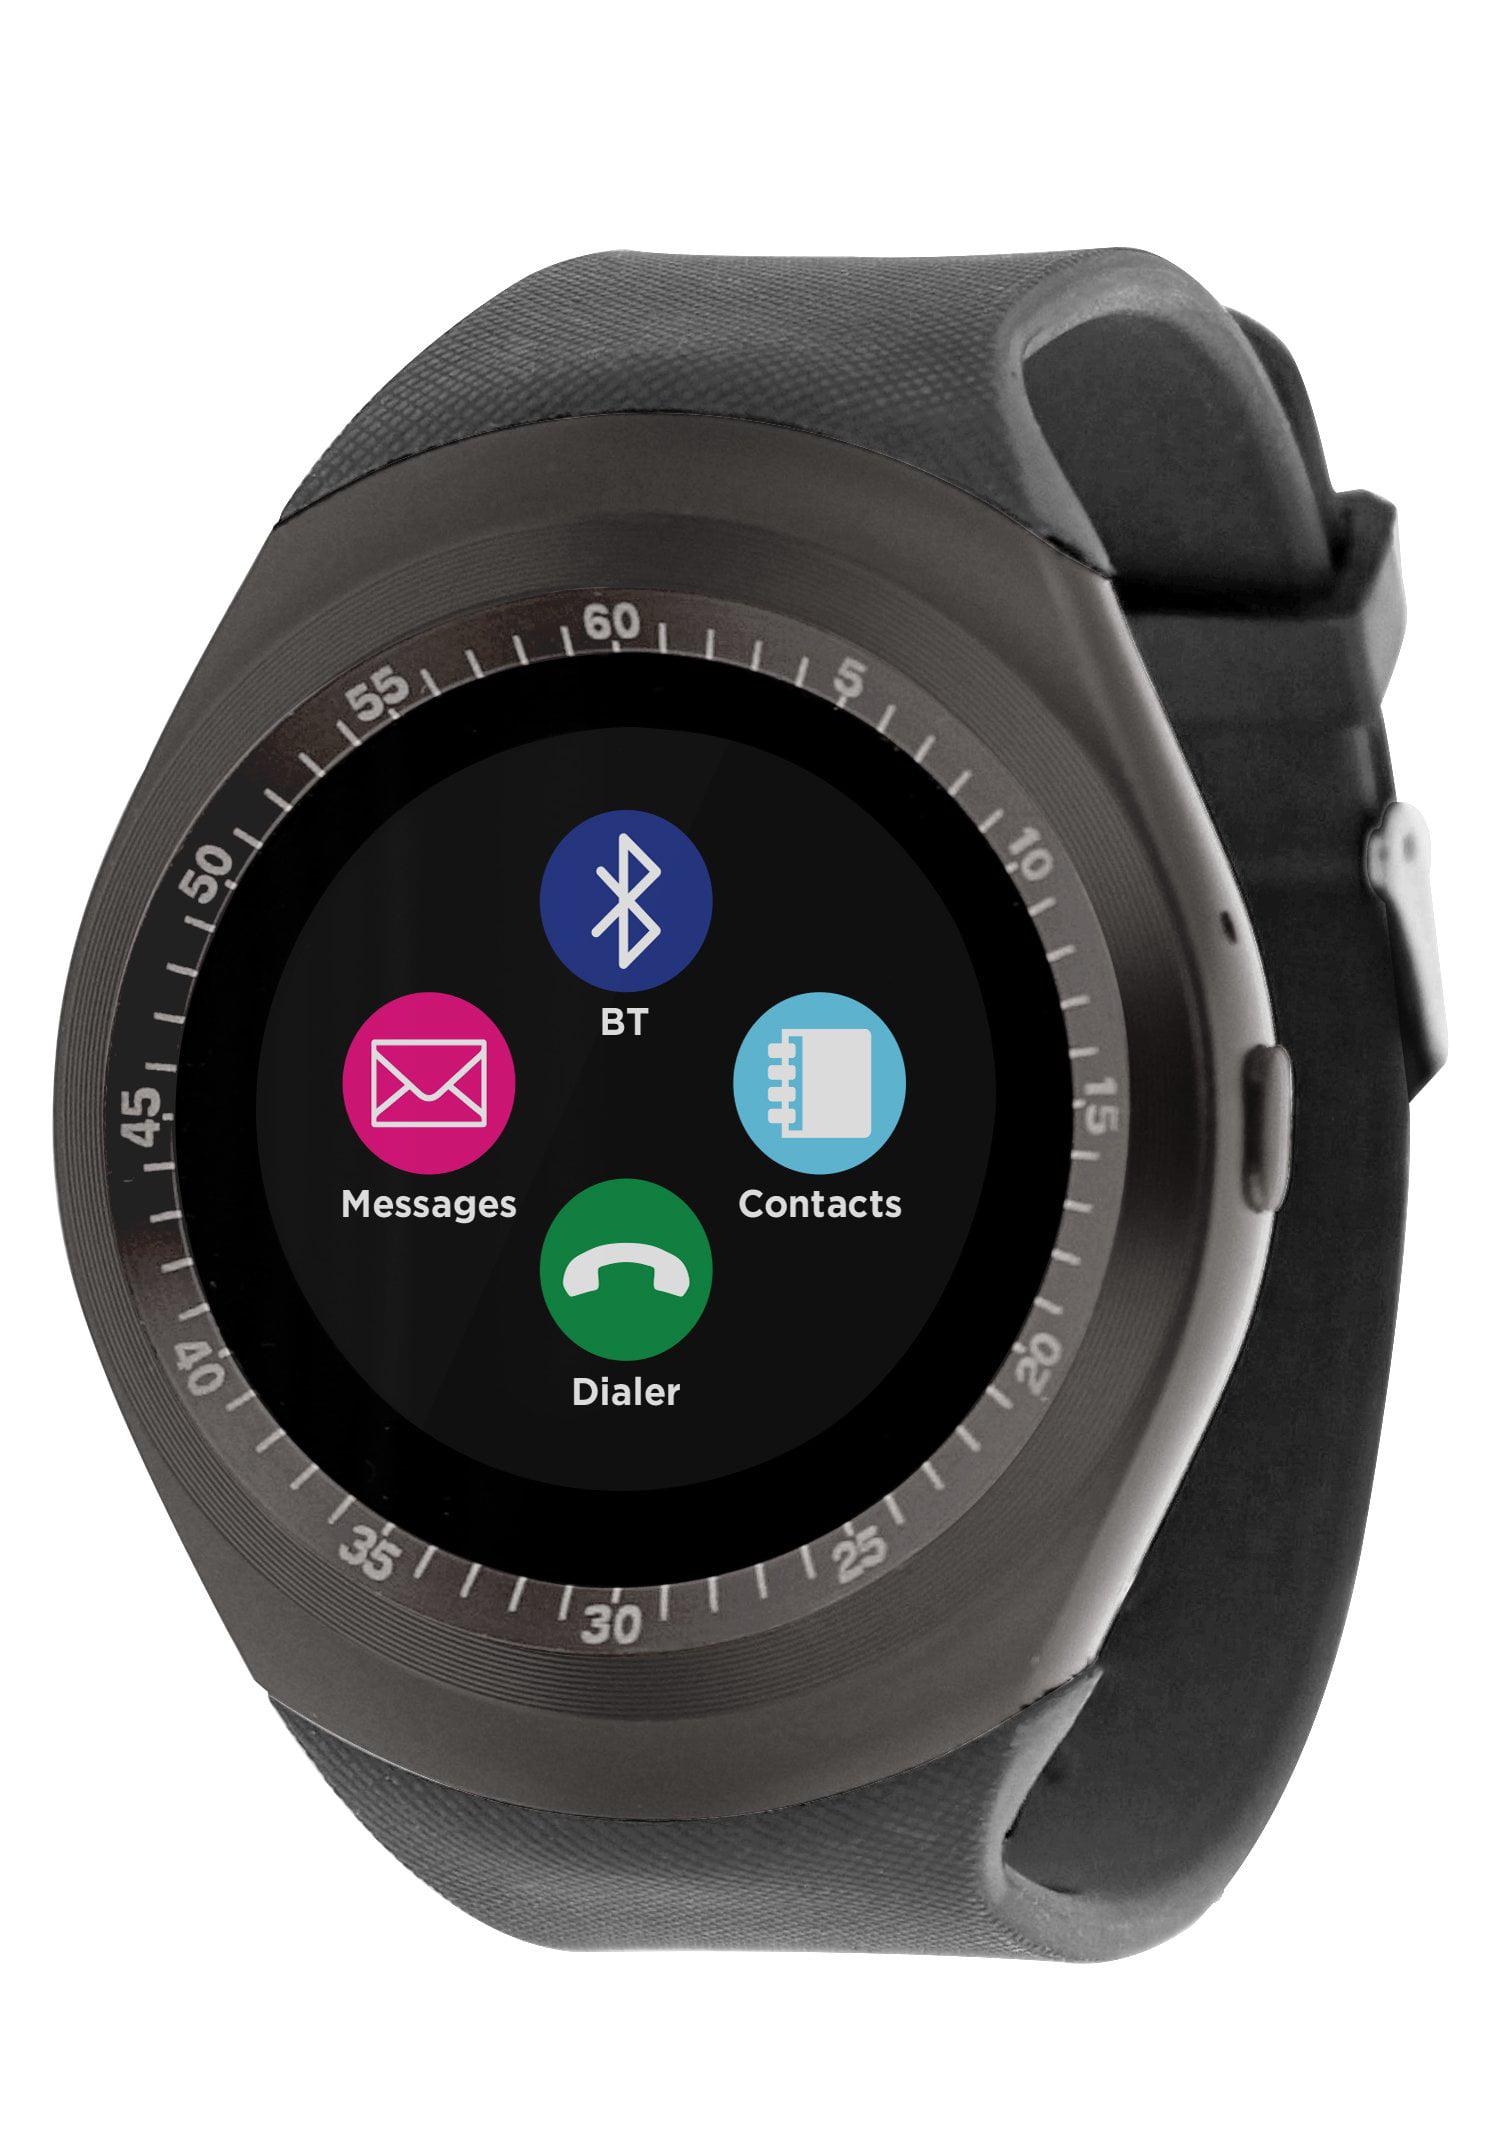 Bluetooth Smart watch phone and Fitness Activity Tracker Touch Screen Smart Wrist Watch